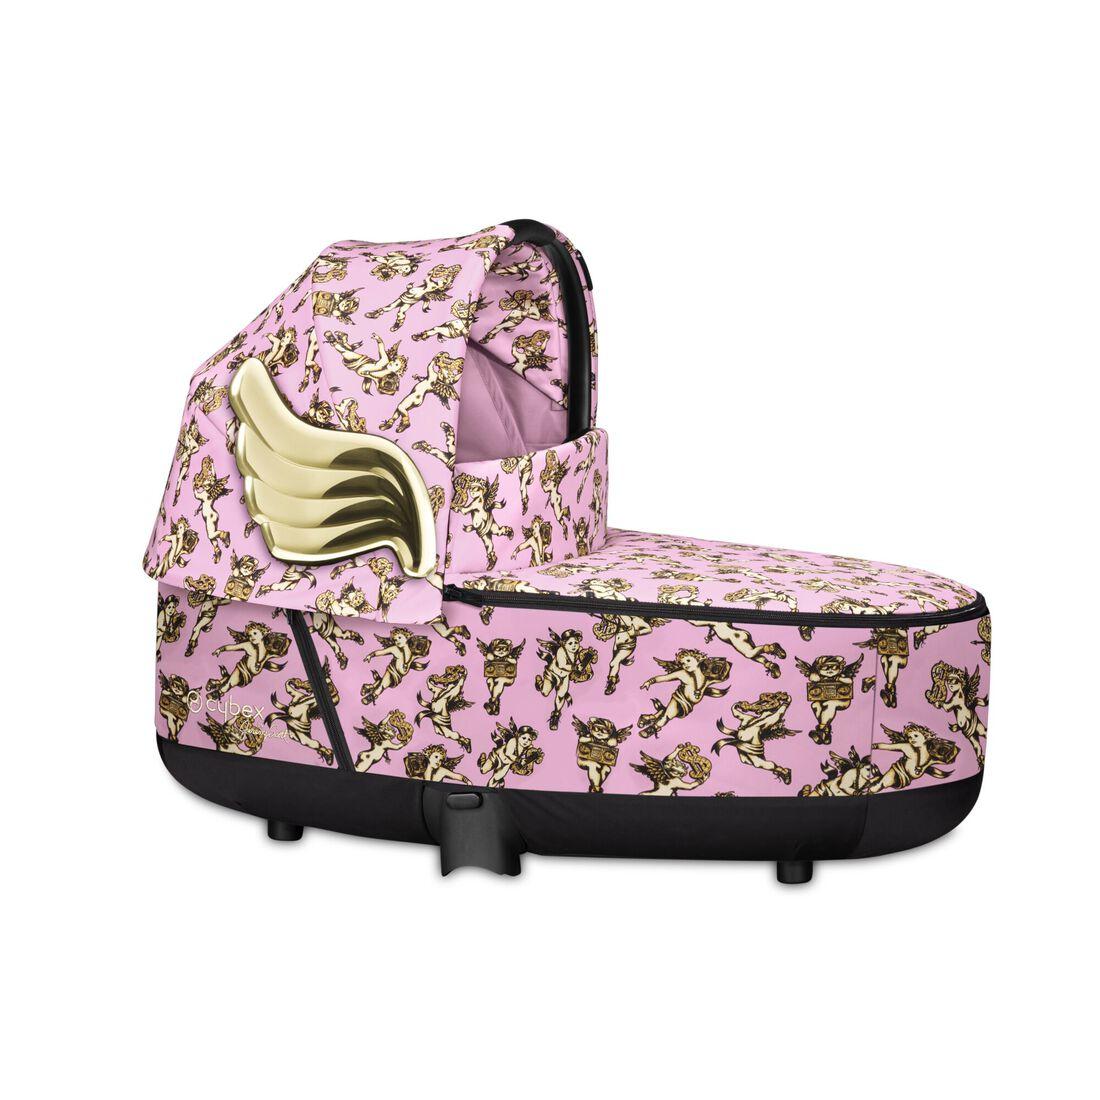 CYBEX Priam Lux Carry Cot - Cherubs Pink in Cherubs Pink large Bild 1